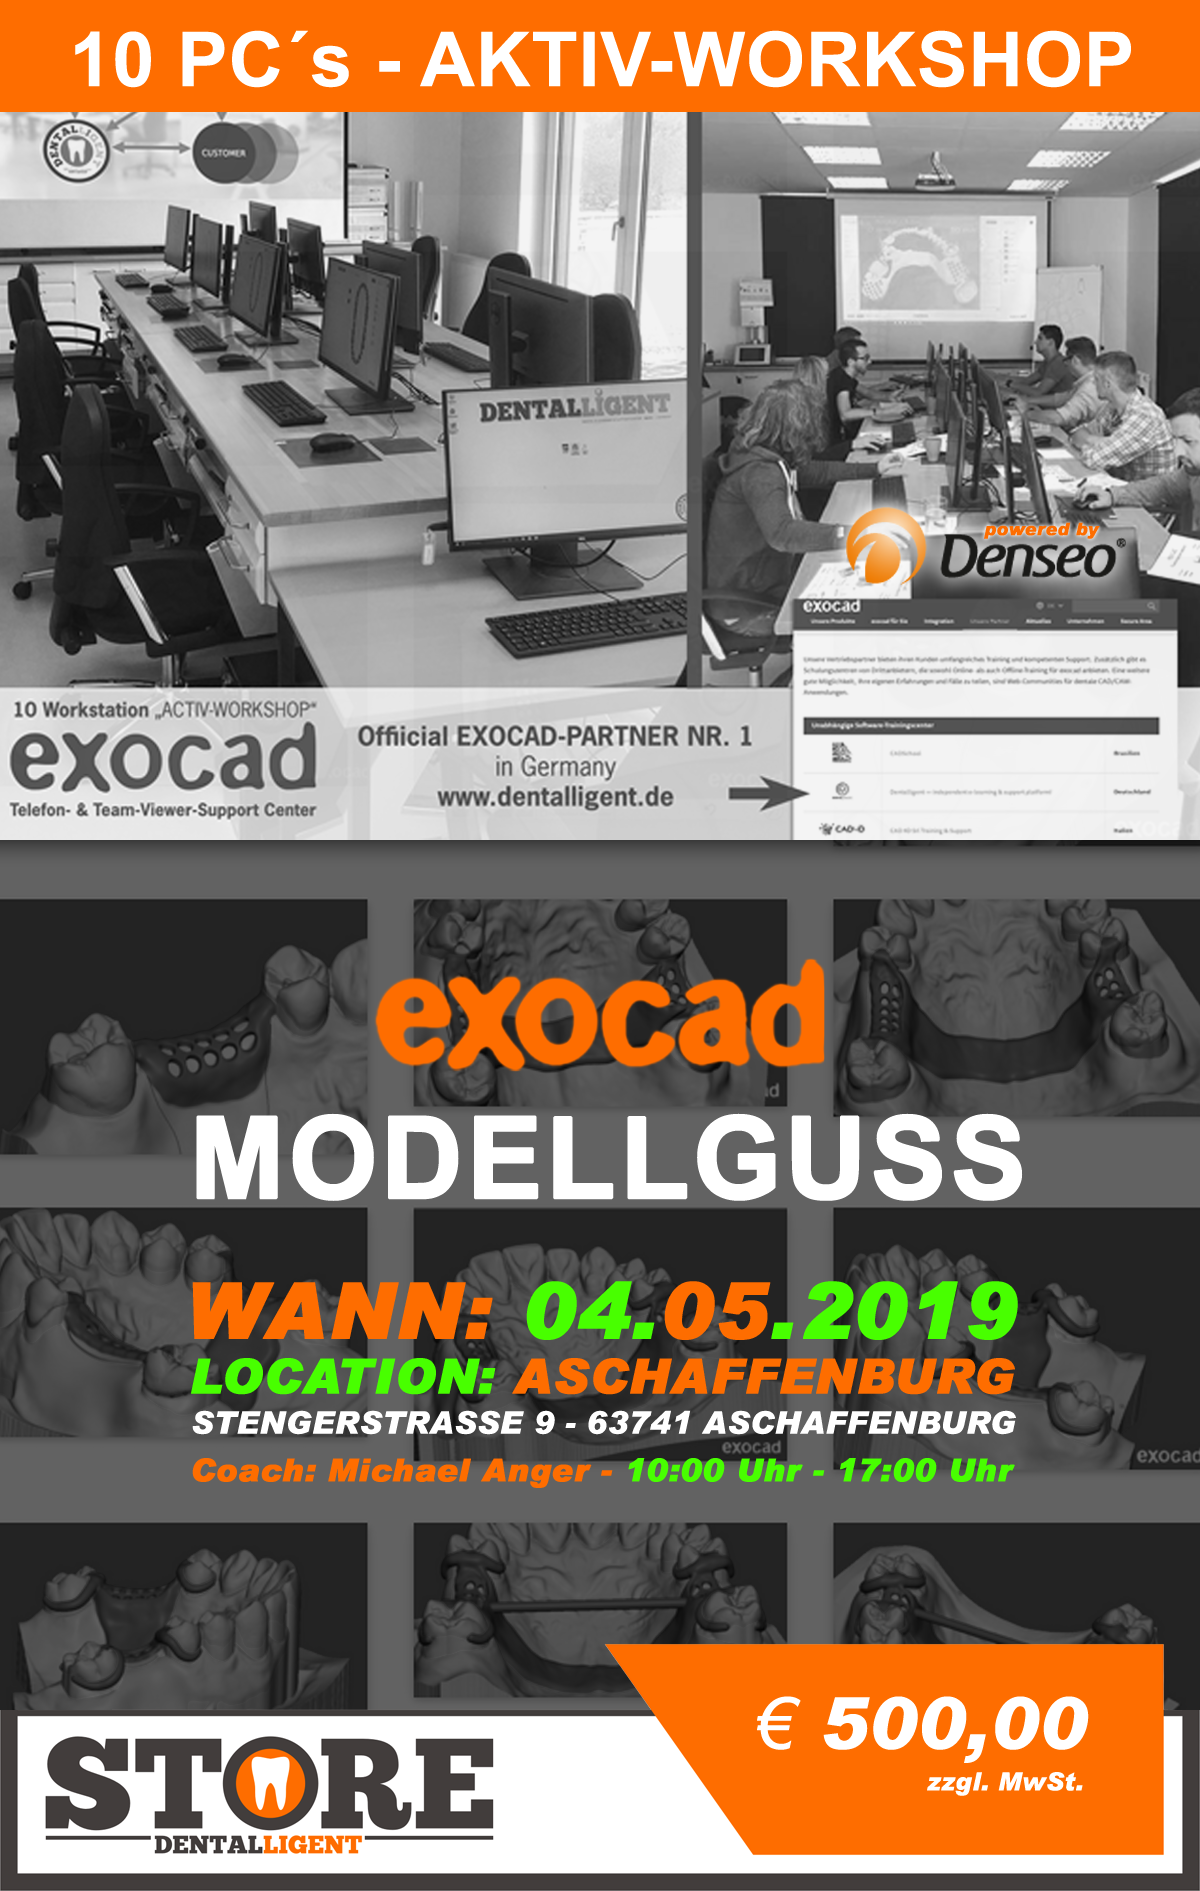 Exocad-Modellguss  by Michael Anger - 10 PC´s AKTIV WORKSHOP -DENSEO GmbH